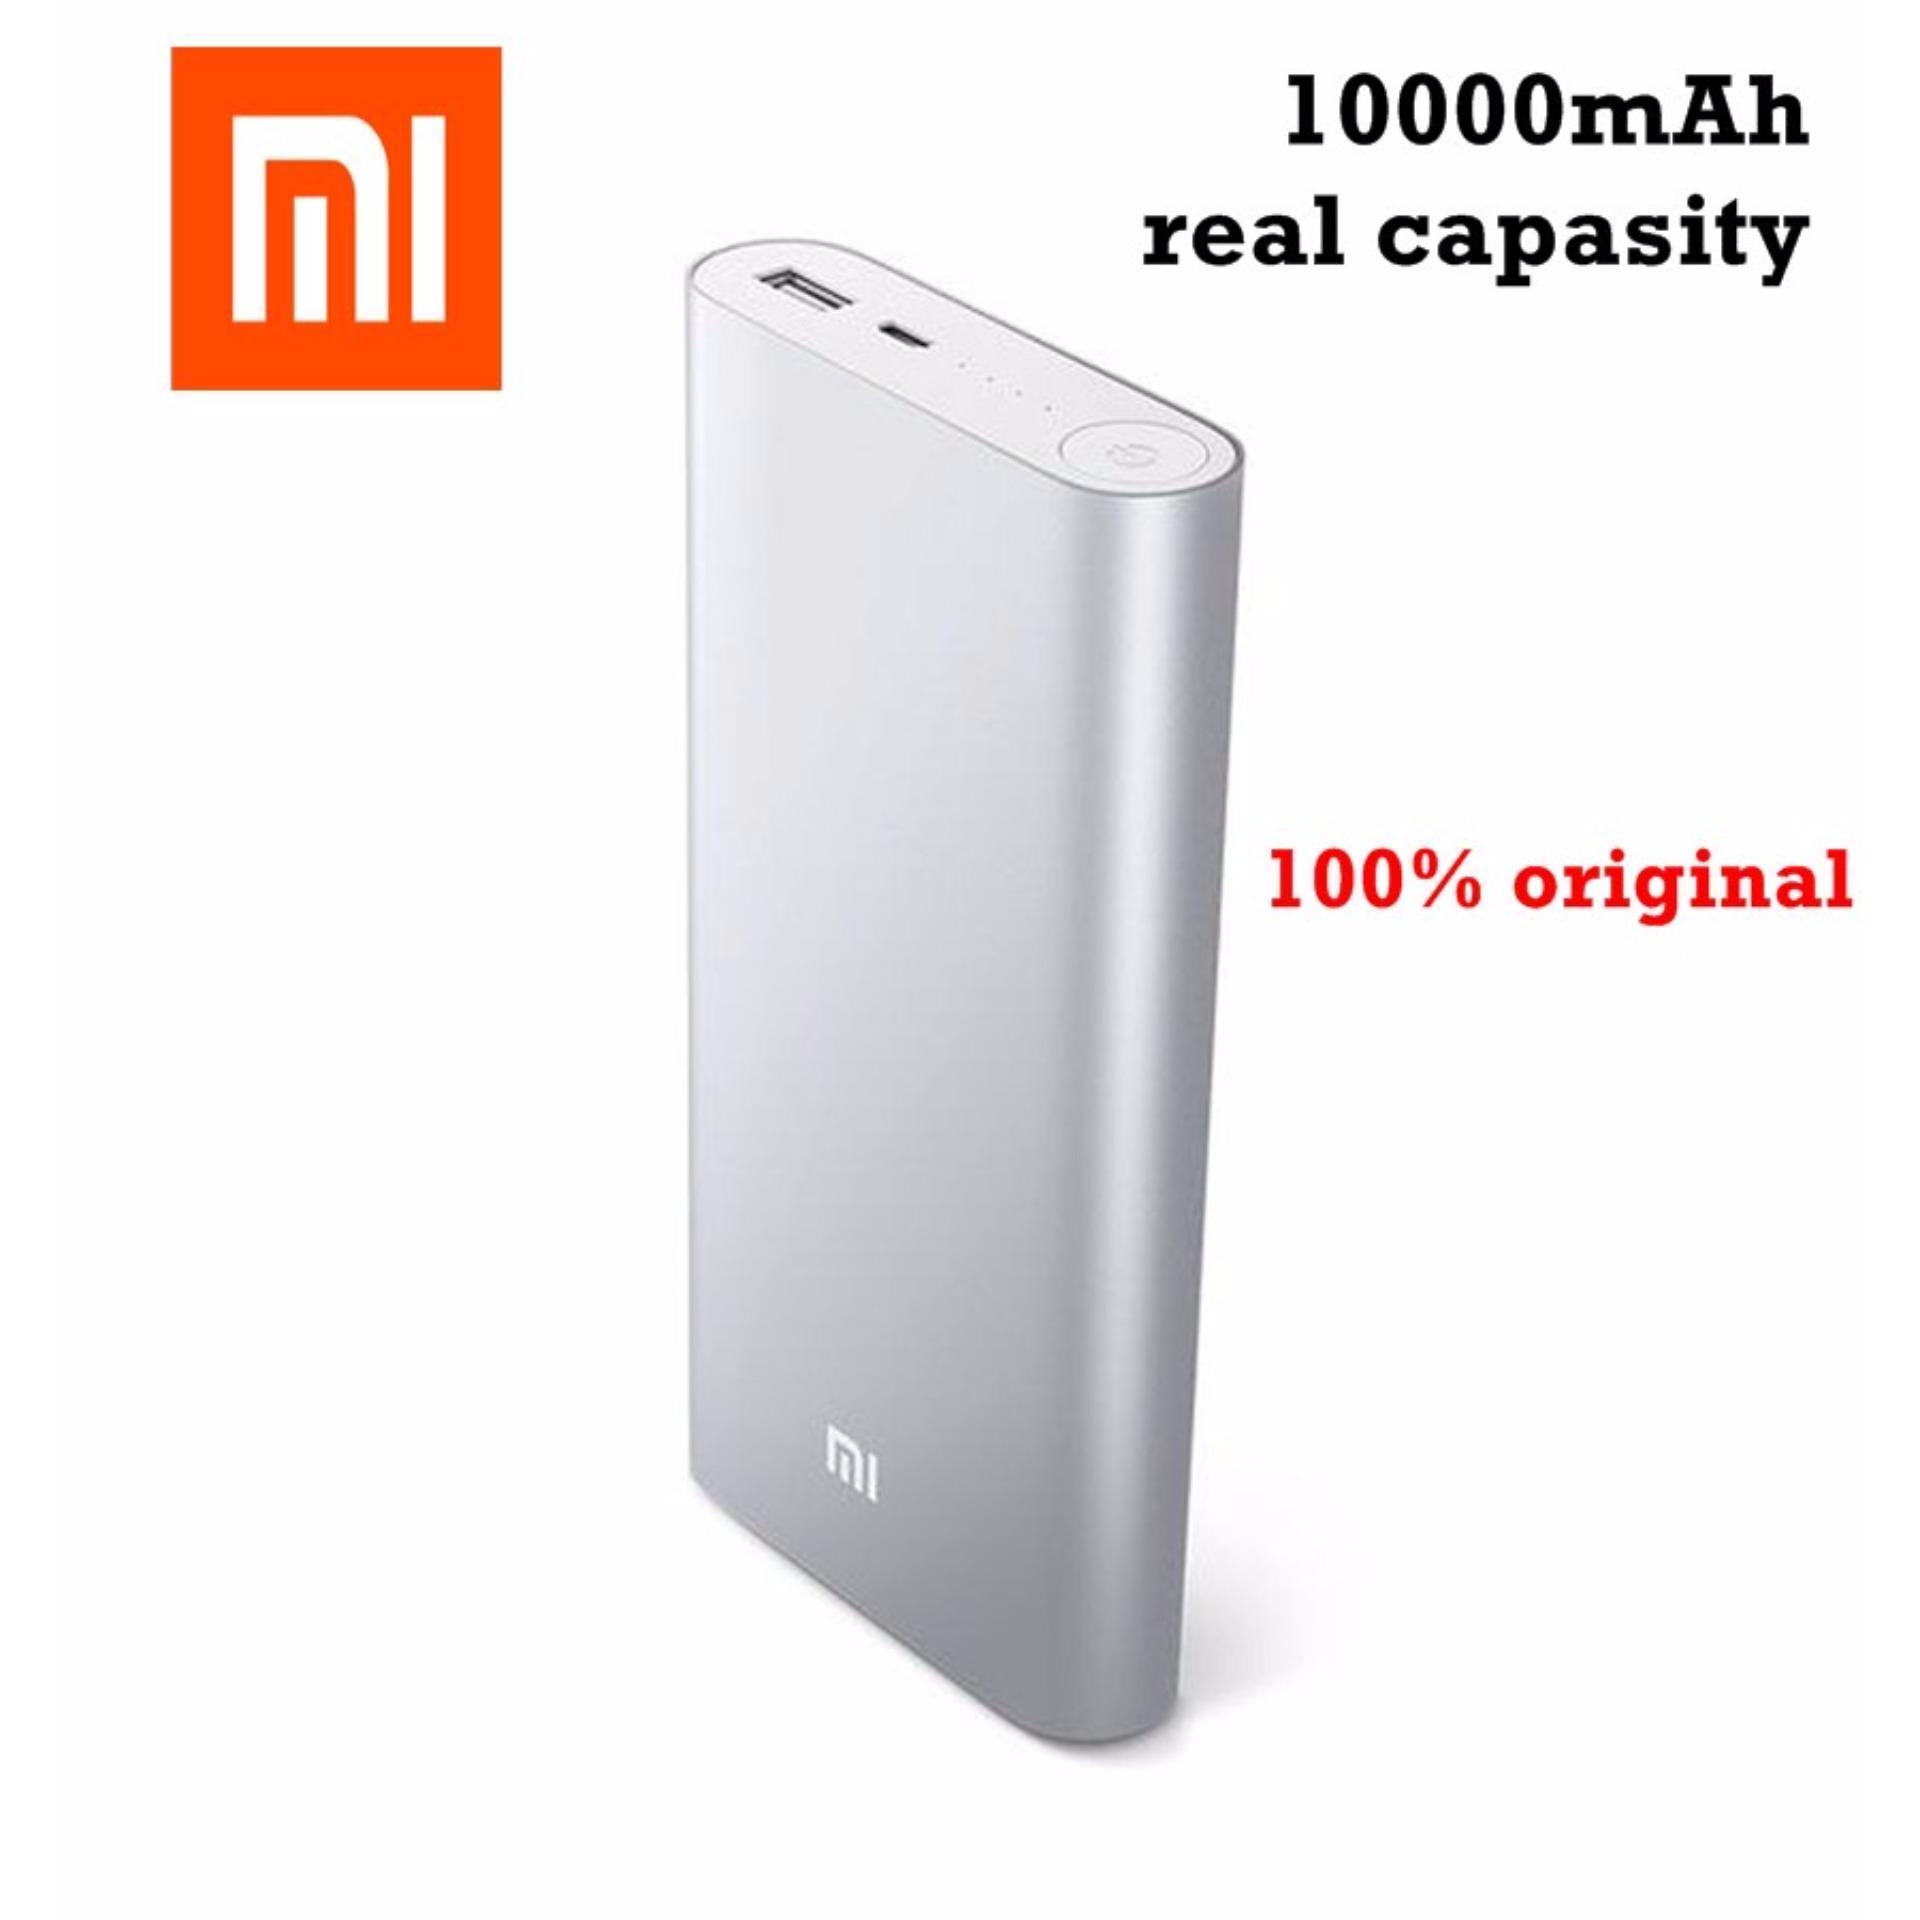 Xiaomi Mi Power Bank 2 - 10000mAh Original Powerbank (Silver)   1 TAHUN GARANSI resmi